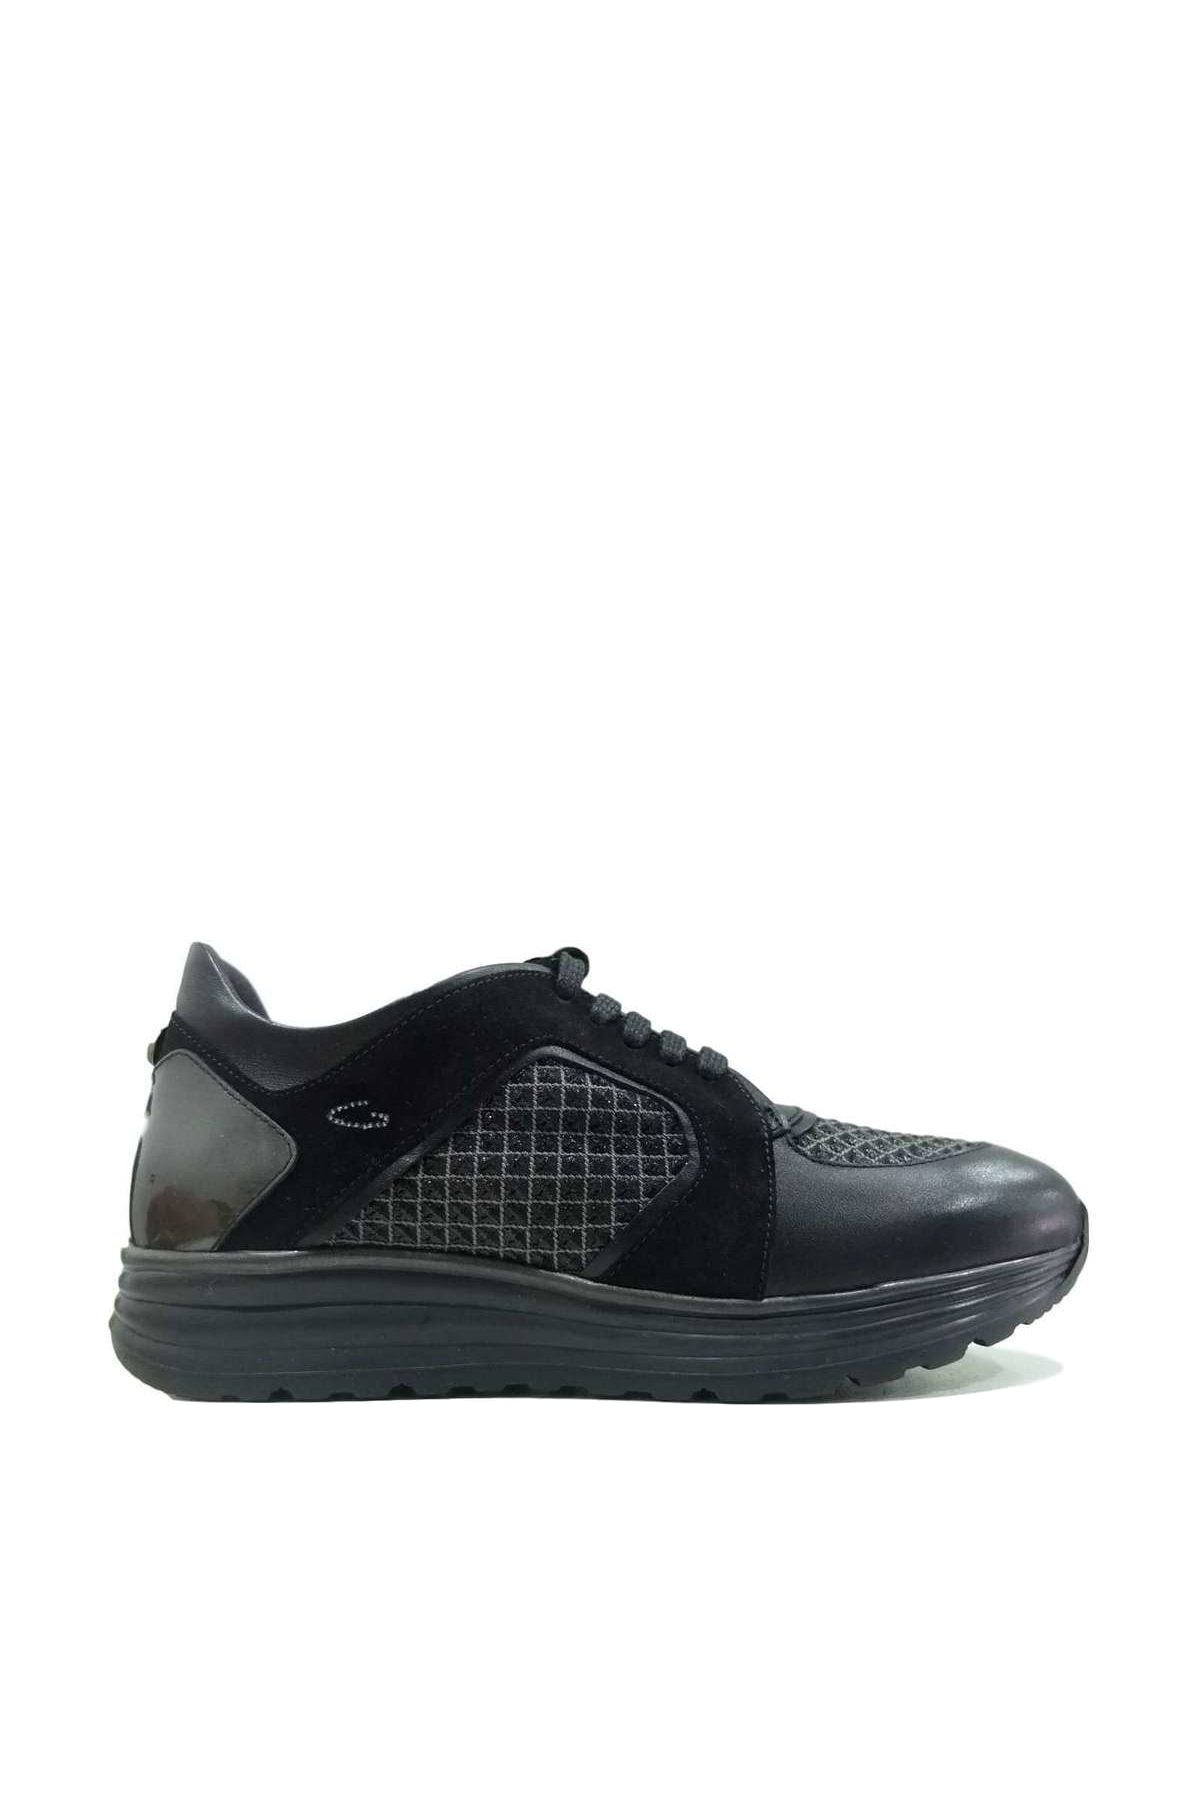 ALBERTO GUARDIANI Kadın Siyah Casual Ayakkabı Sd59431E-Ax00 1